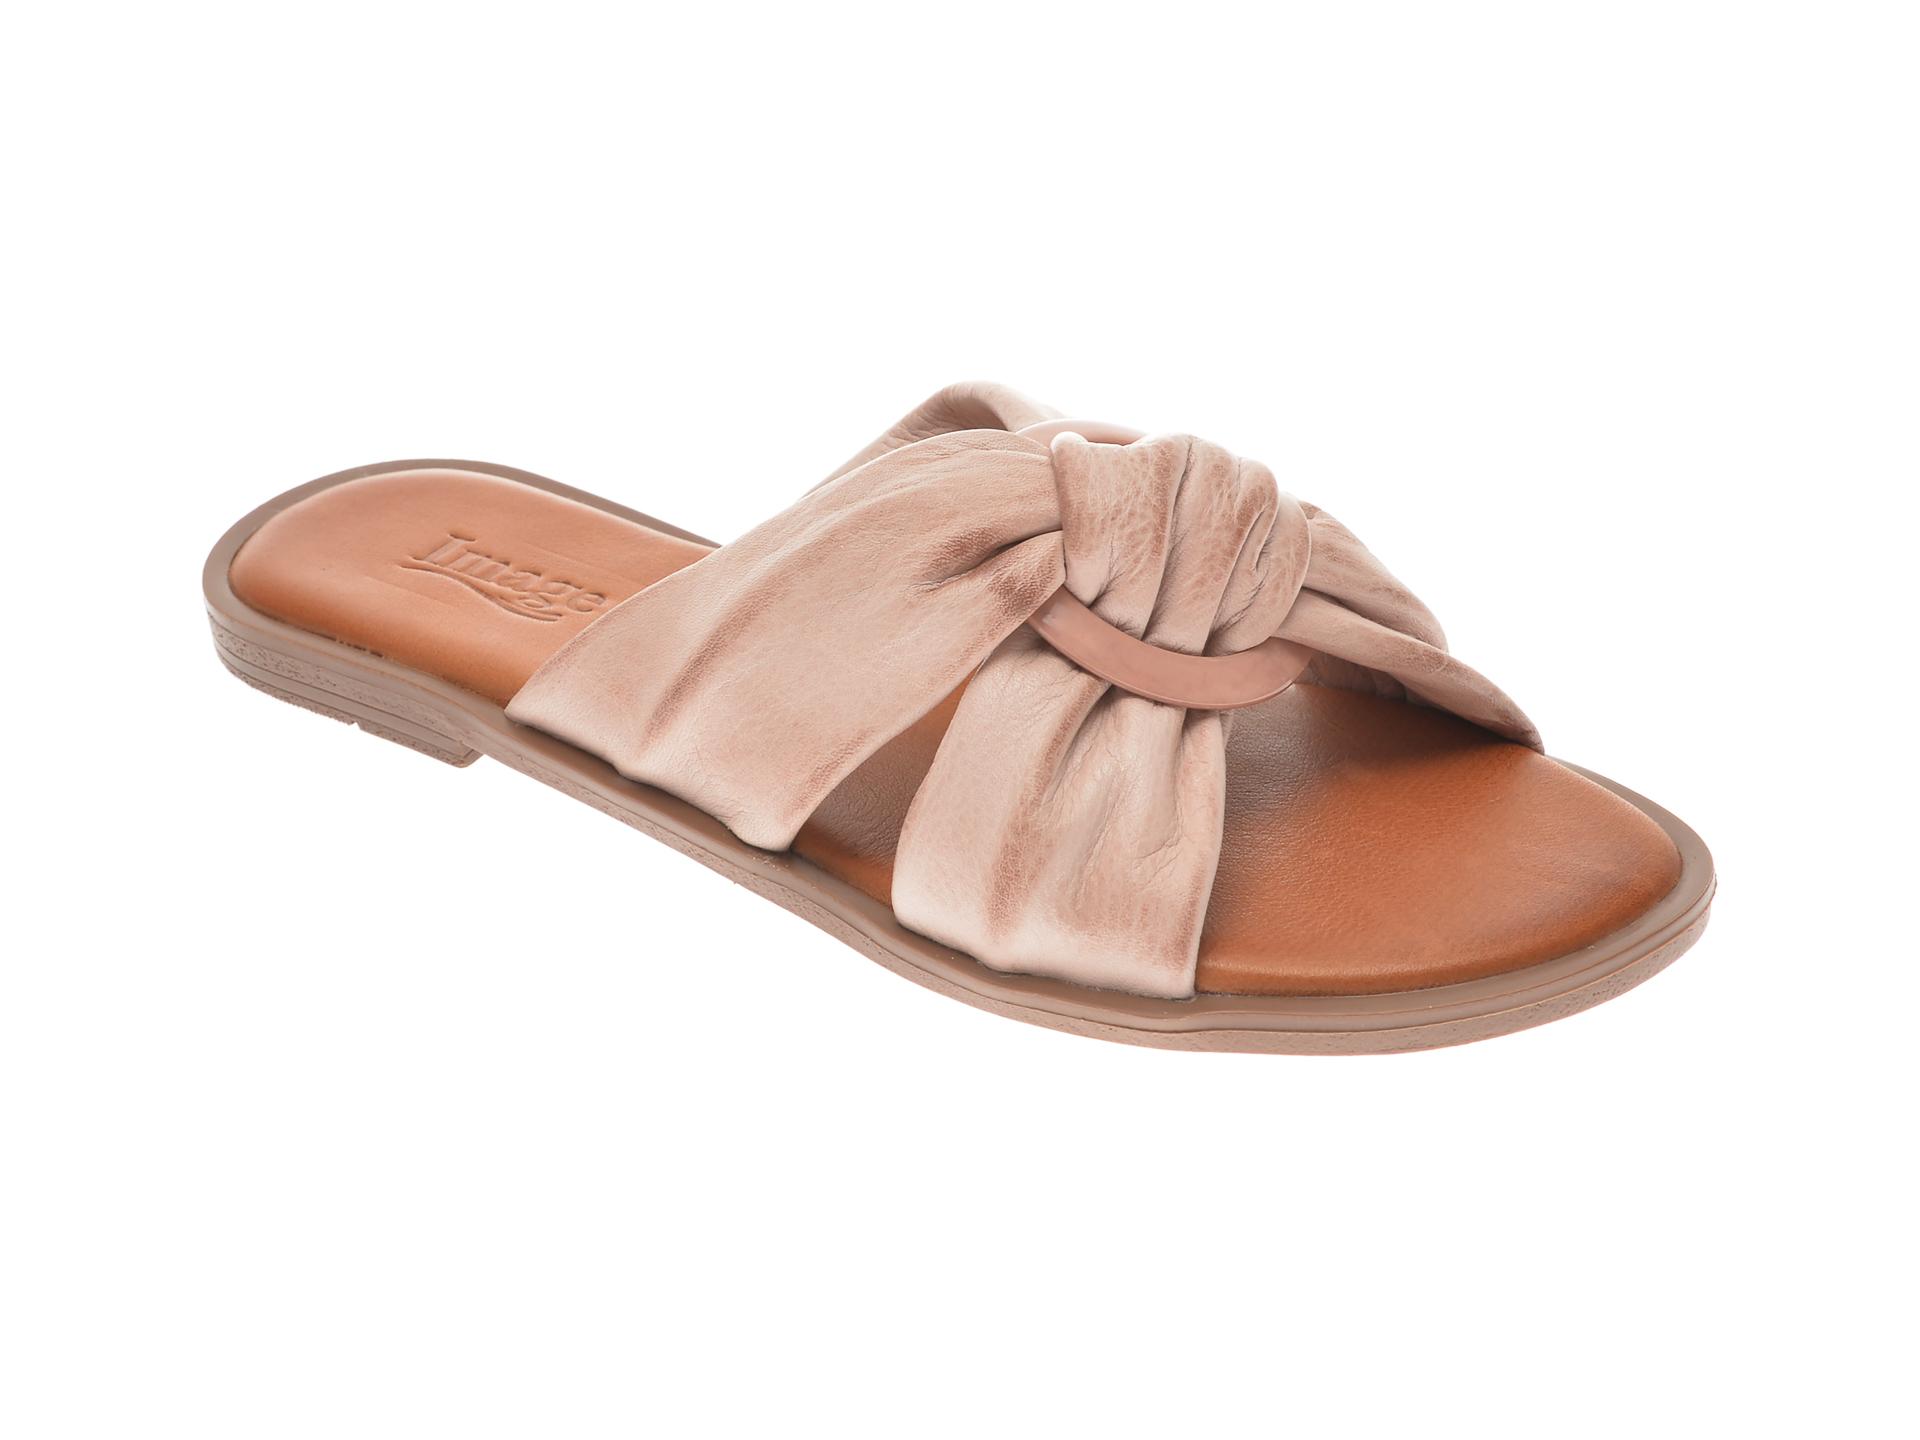 Papuci IMAGE nude, 100307, din piele naturala New